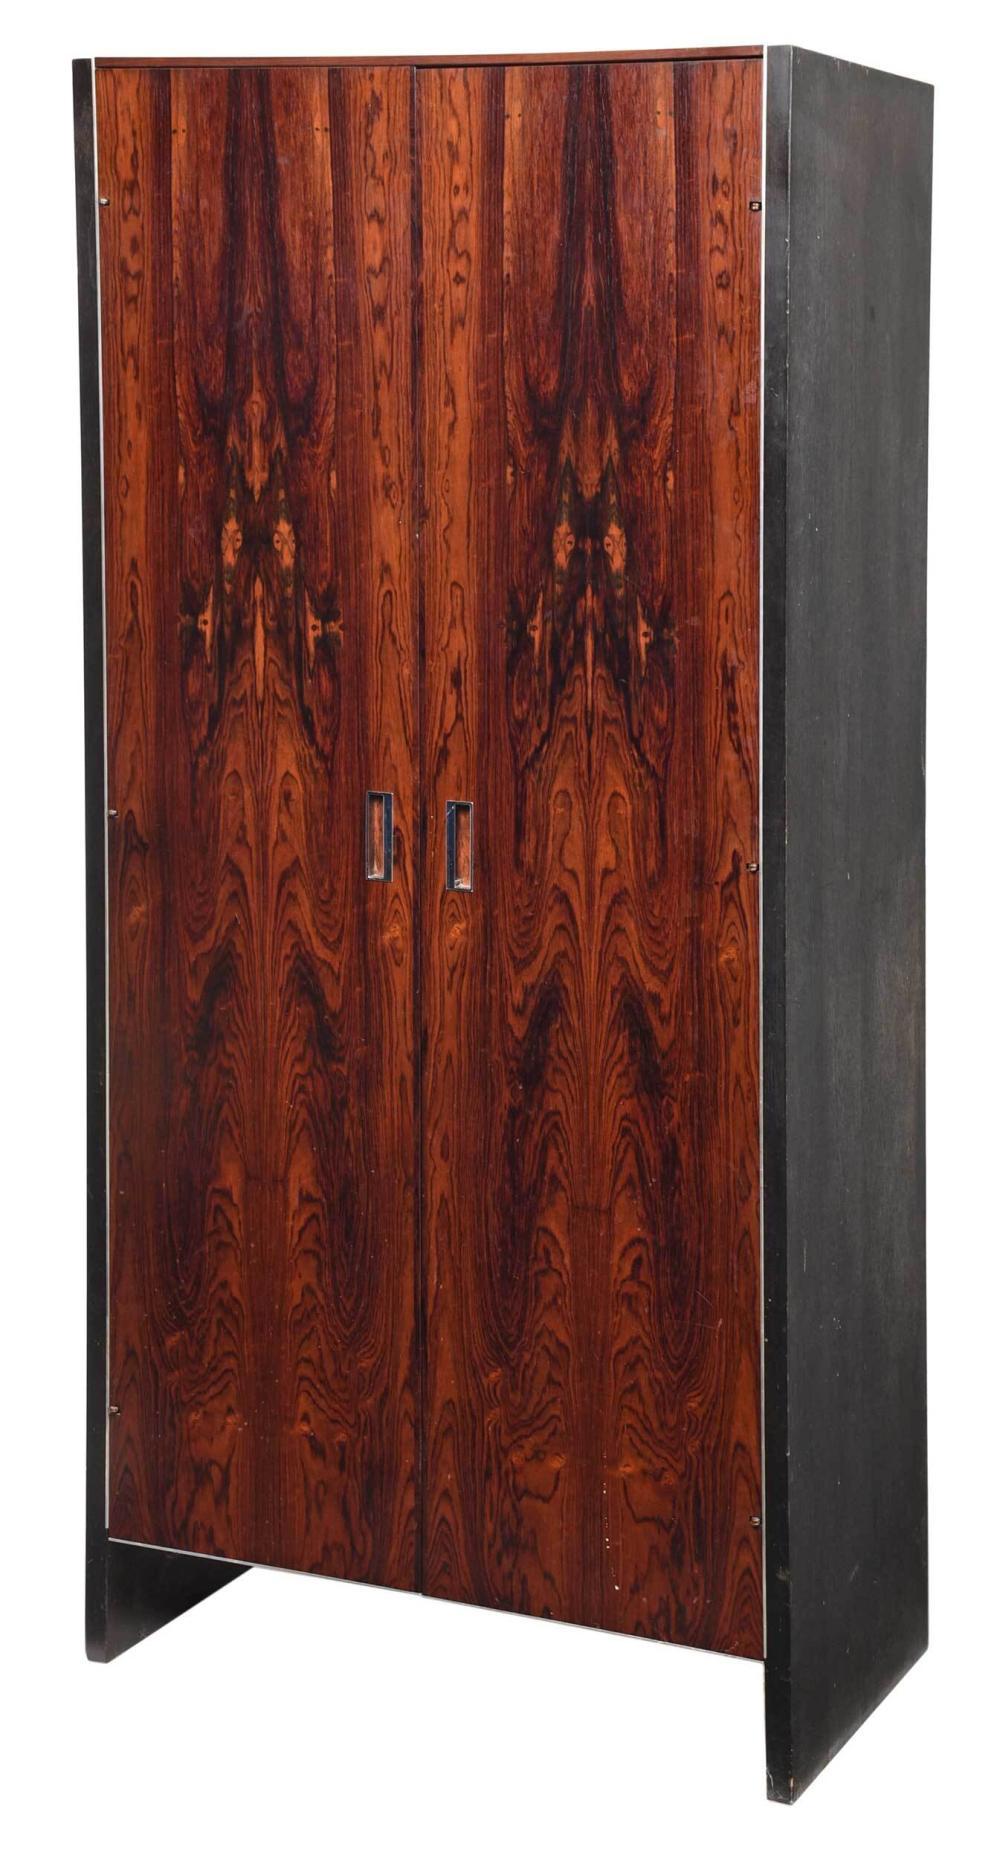 Mid Century Modern Rosewood Veneered Wardrobe